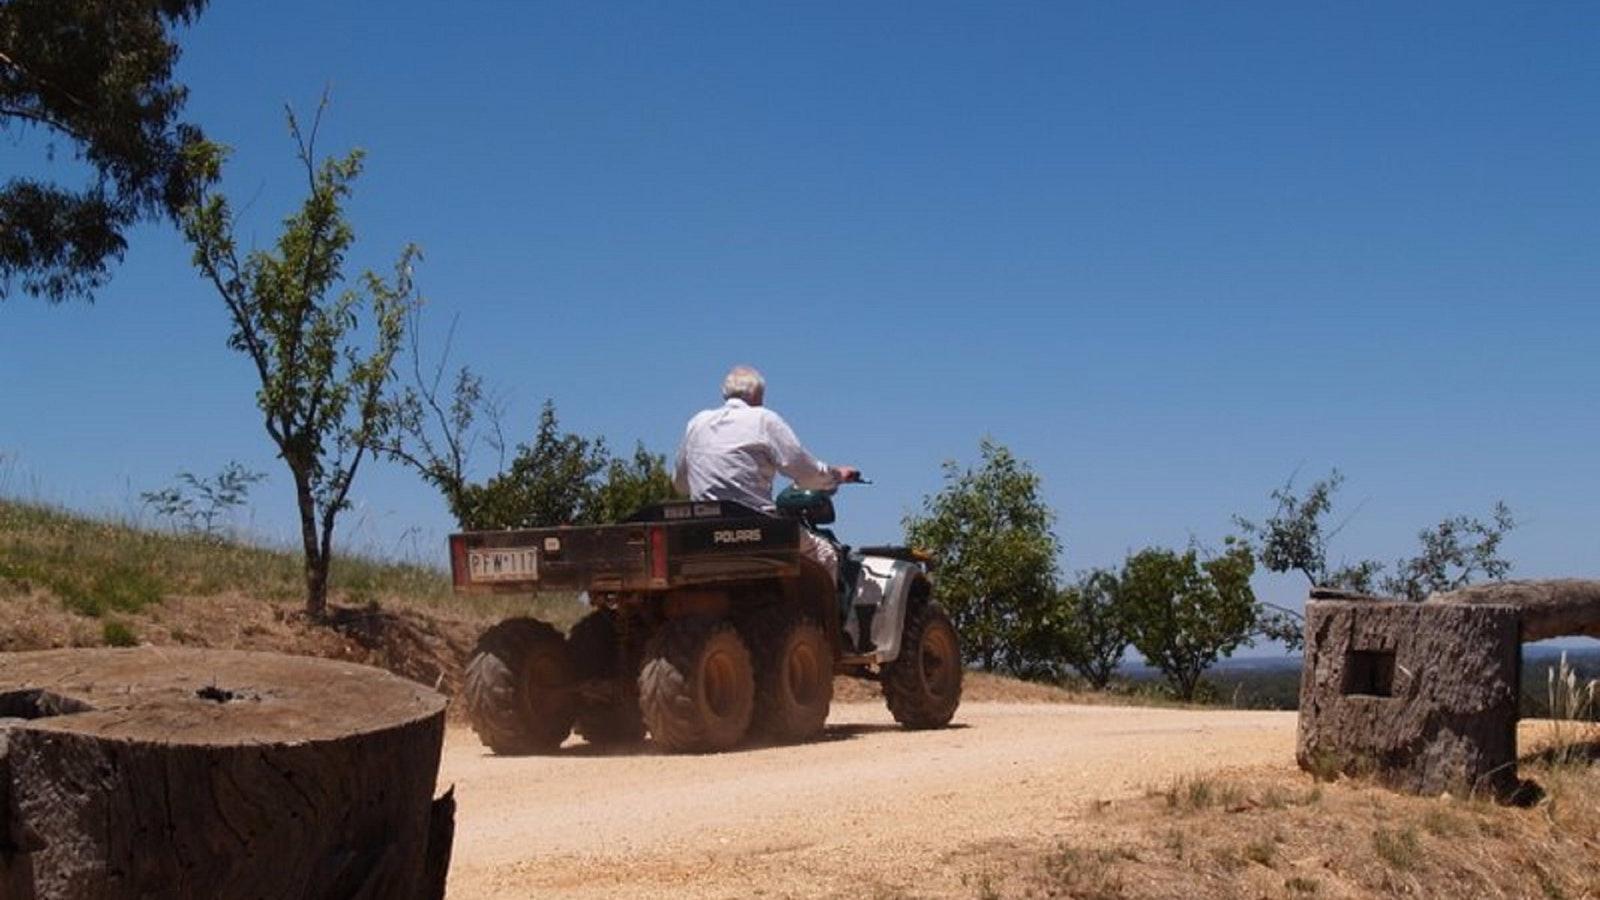 Winemaker on quadbike off to work